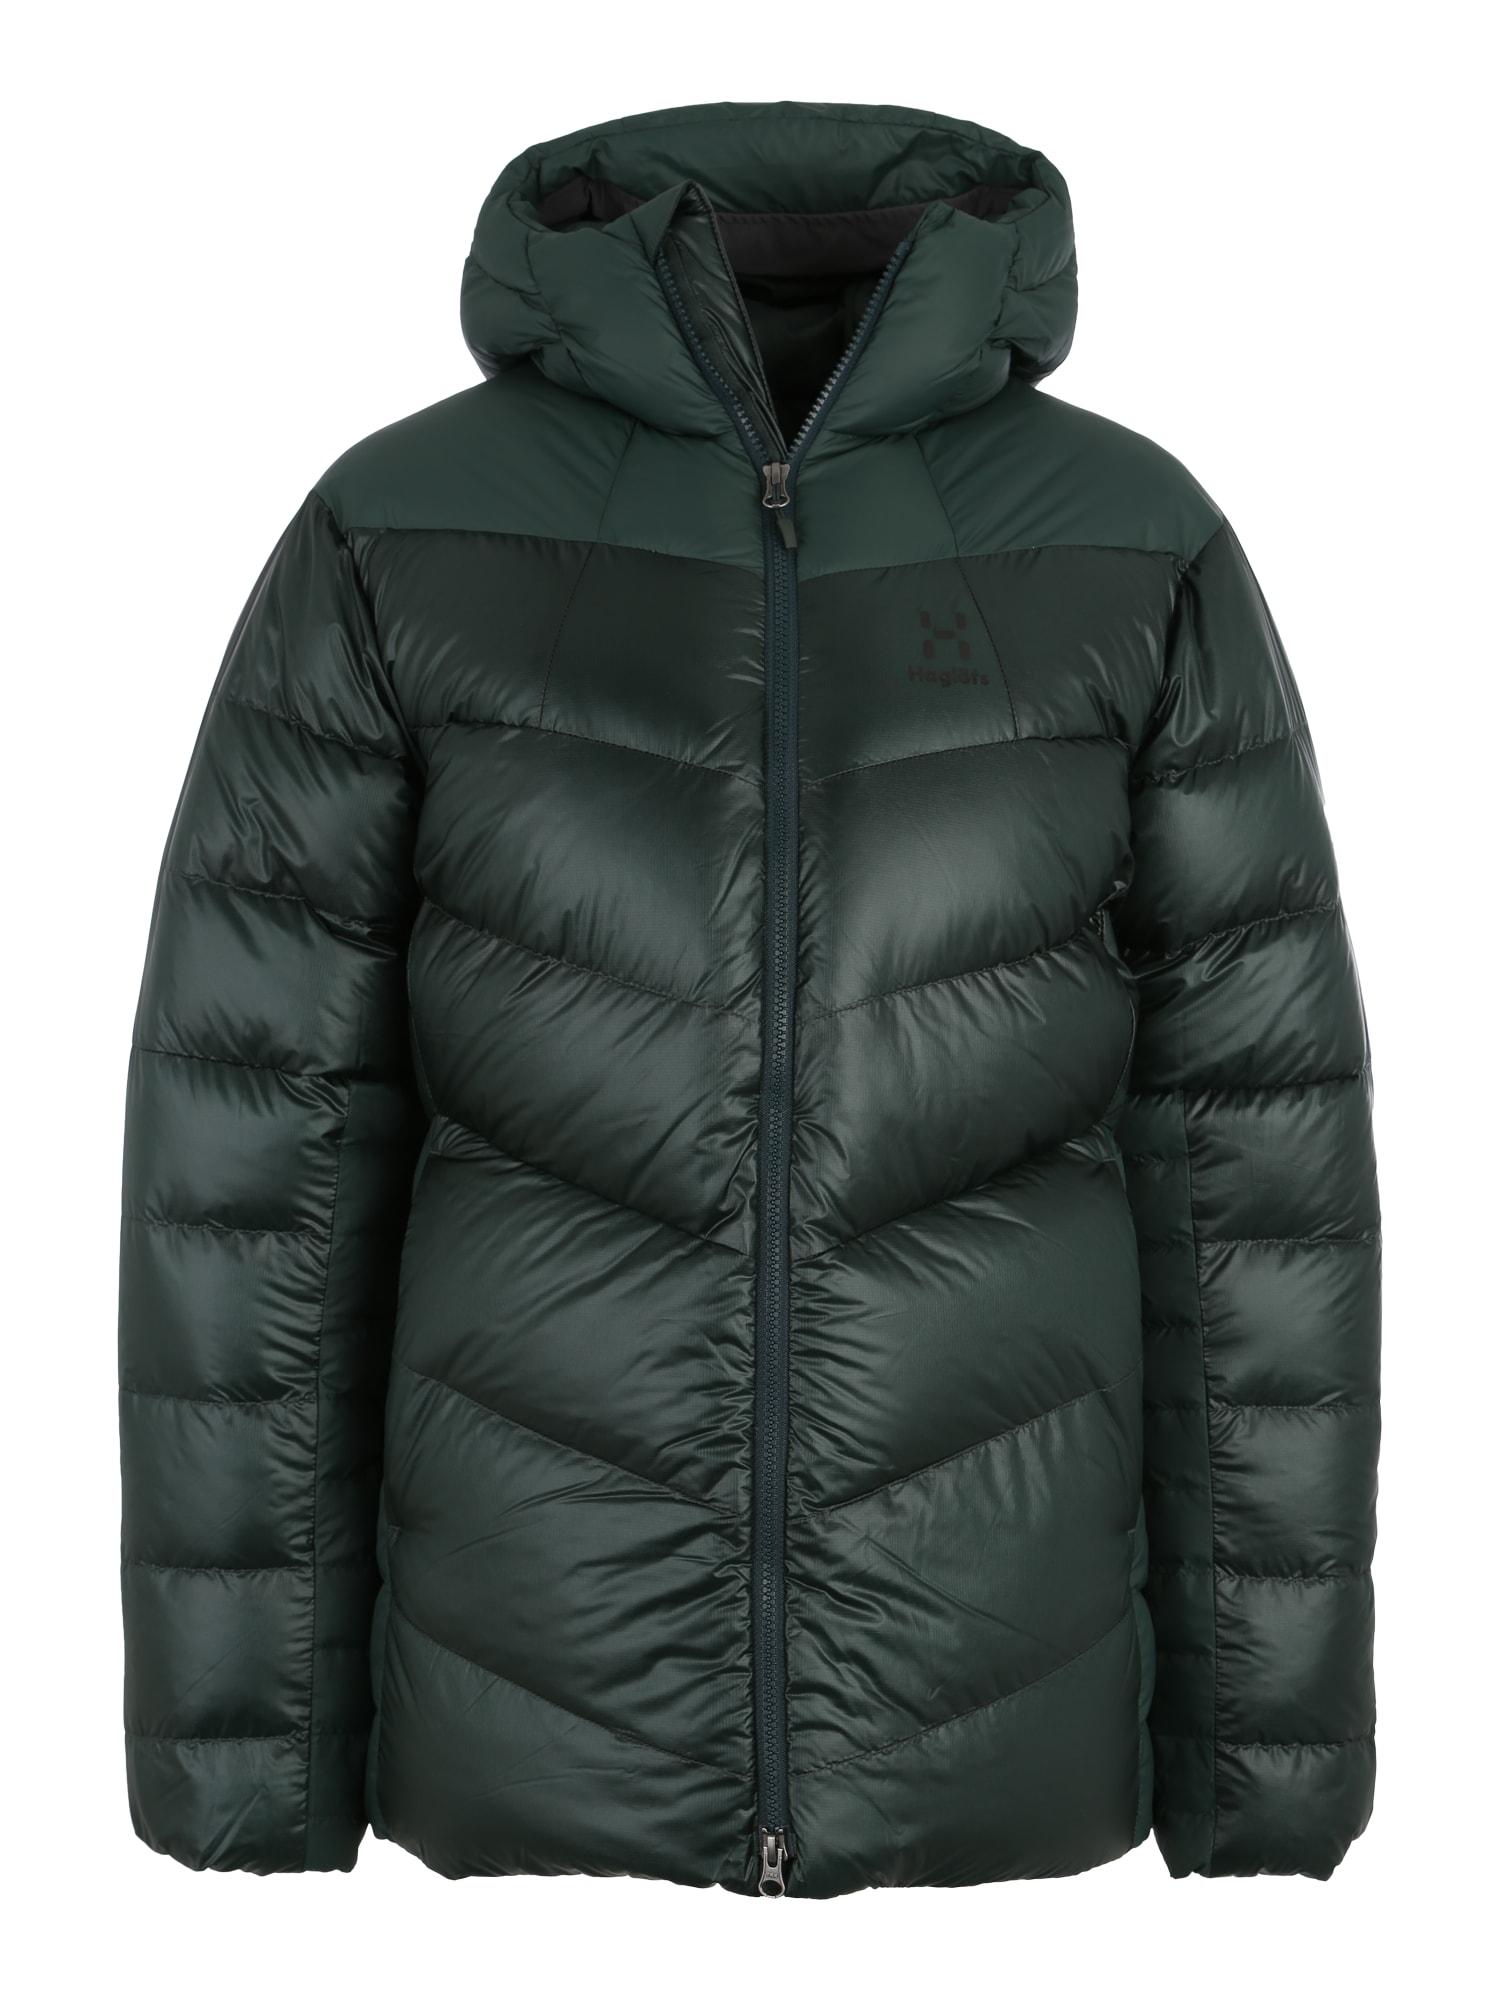 Outdoorová bunda Magi jedle Haglöfs